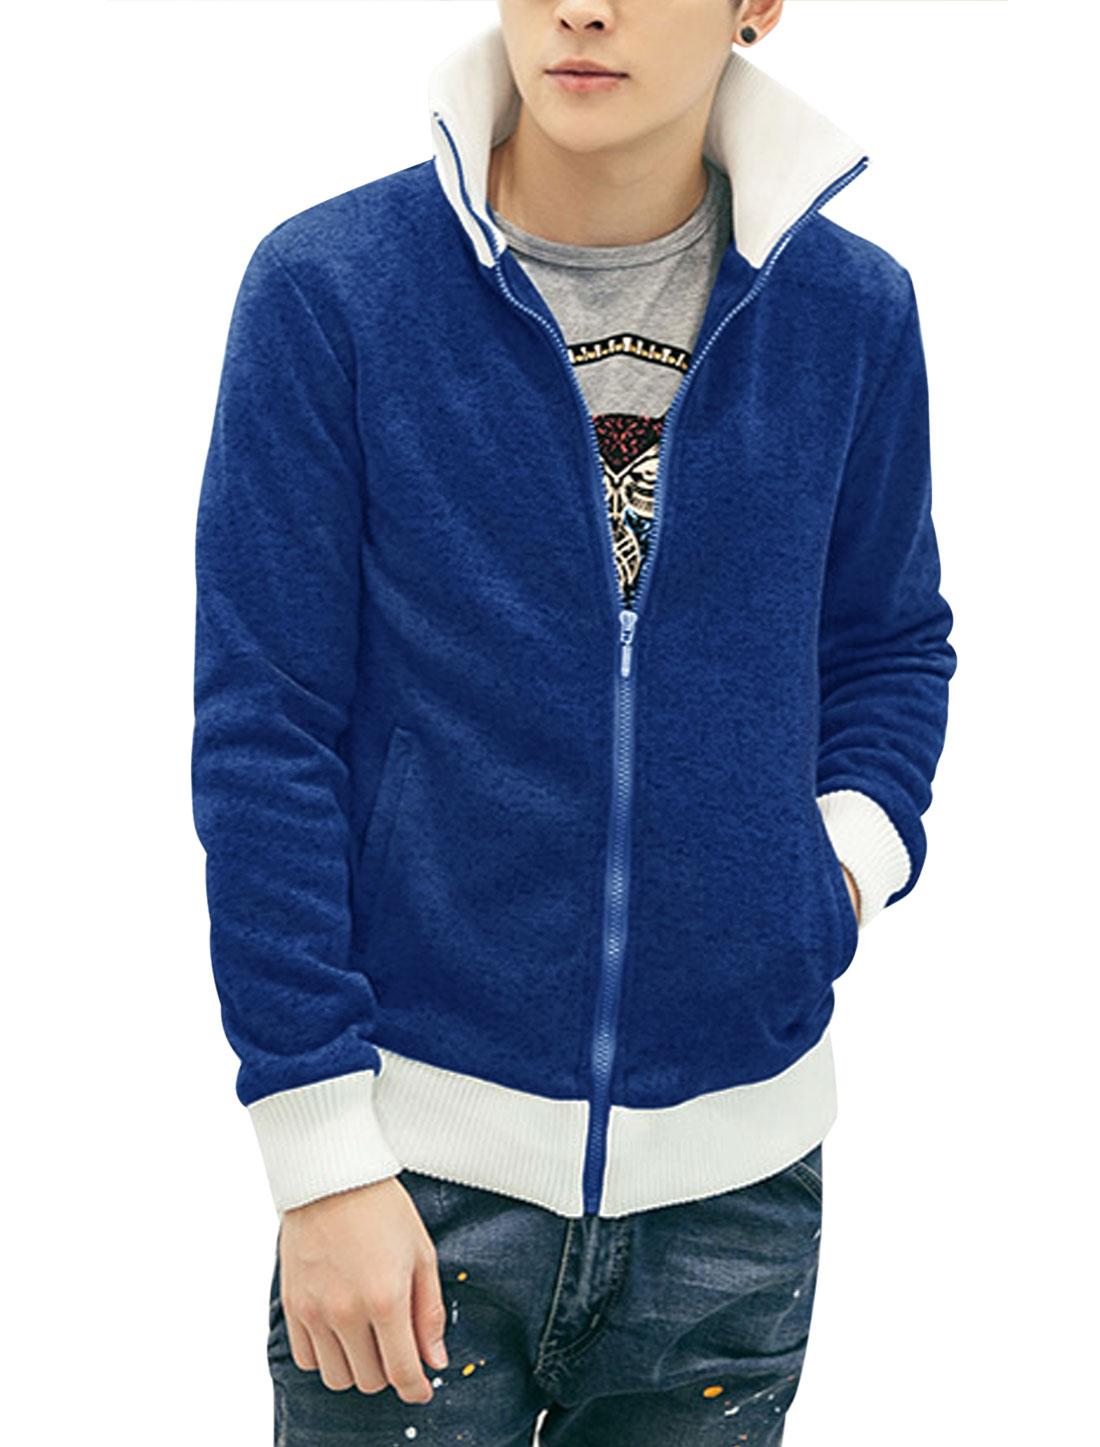 Men Zip Up Color Block Detail Leisure Light Jacket Royal Blue M